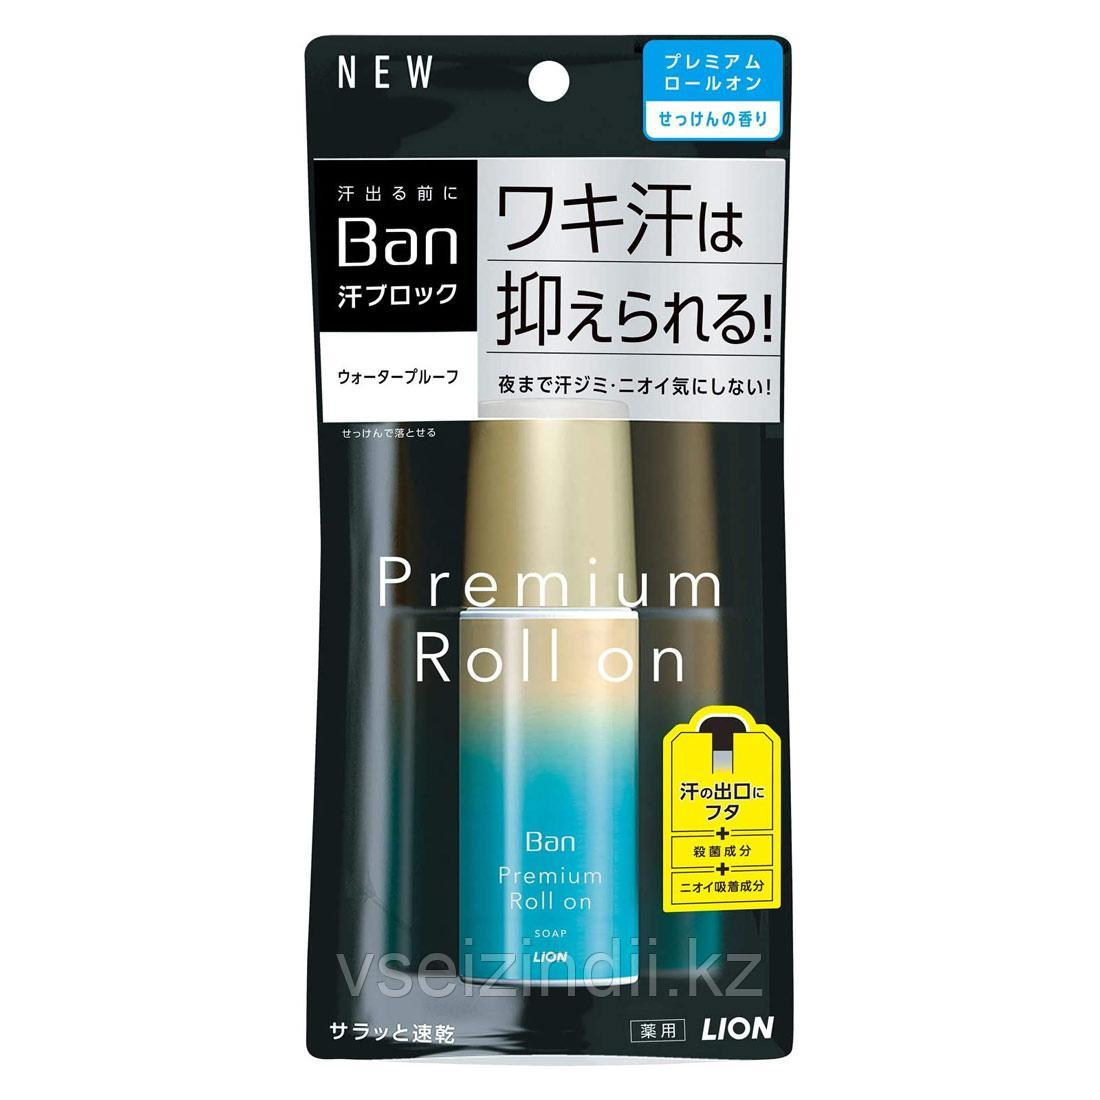 Дезодорант  Premium Roll on голубой 40 мл